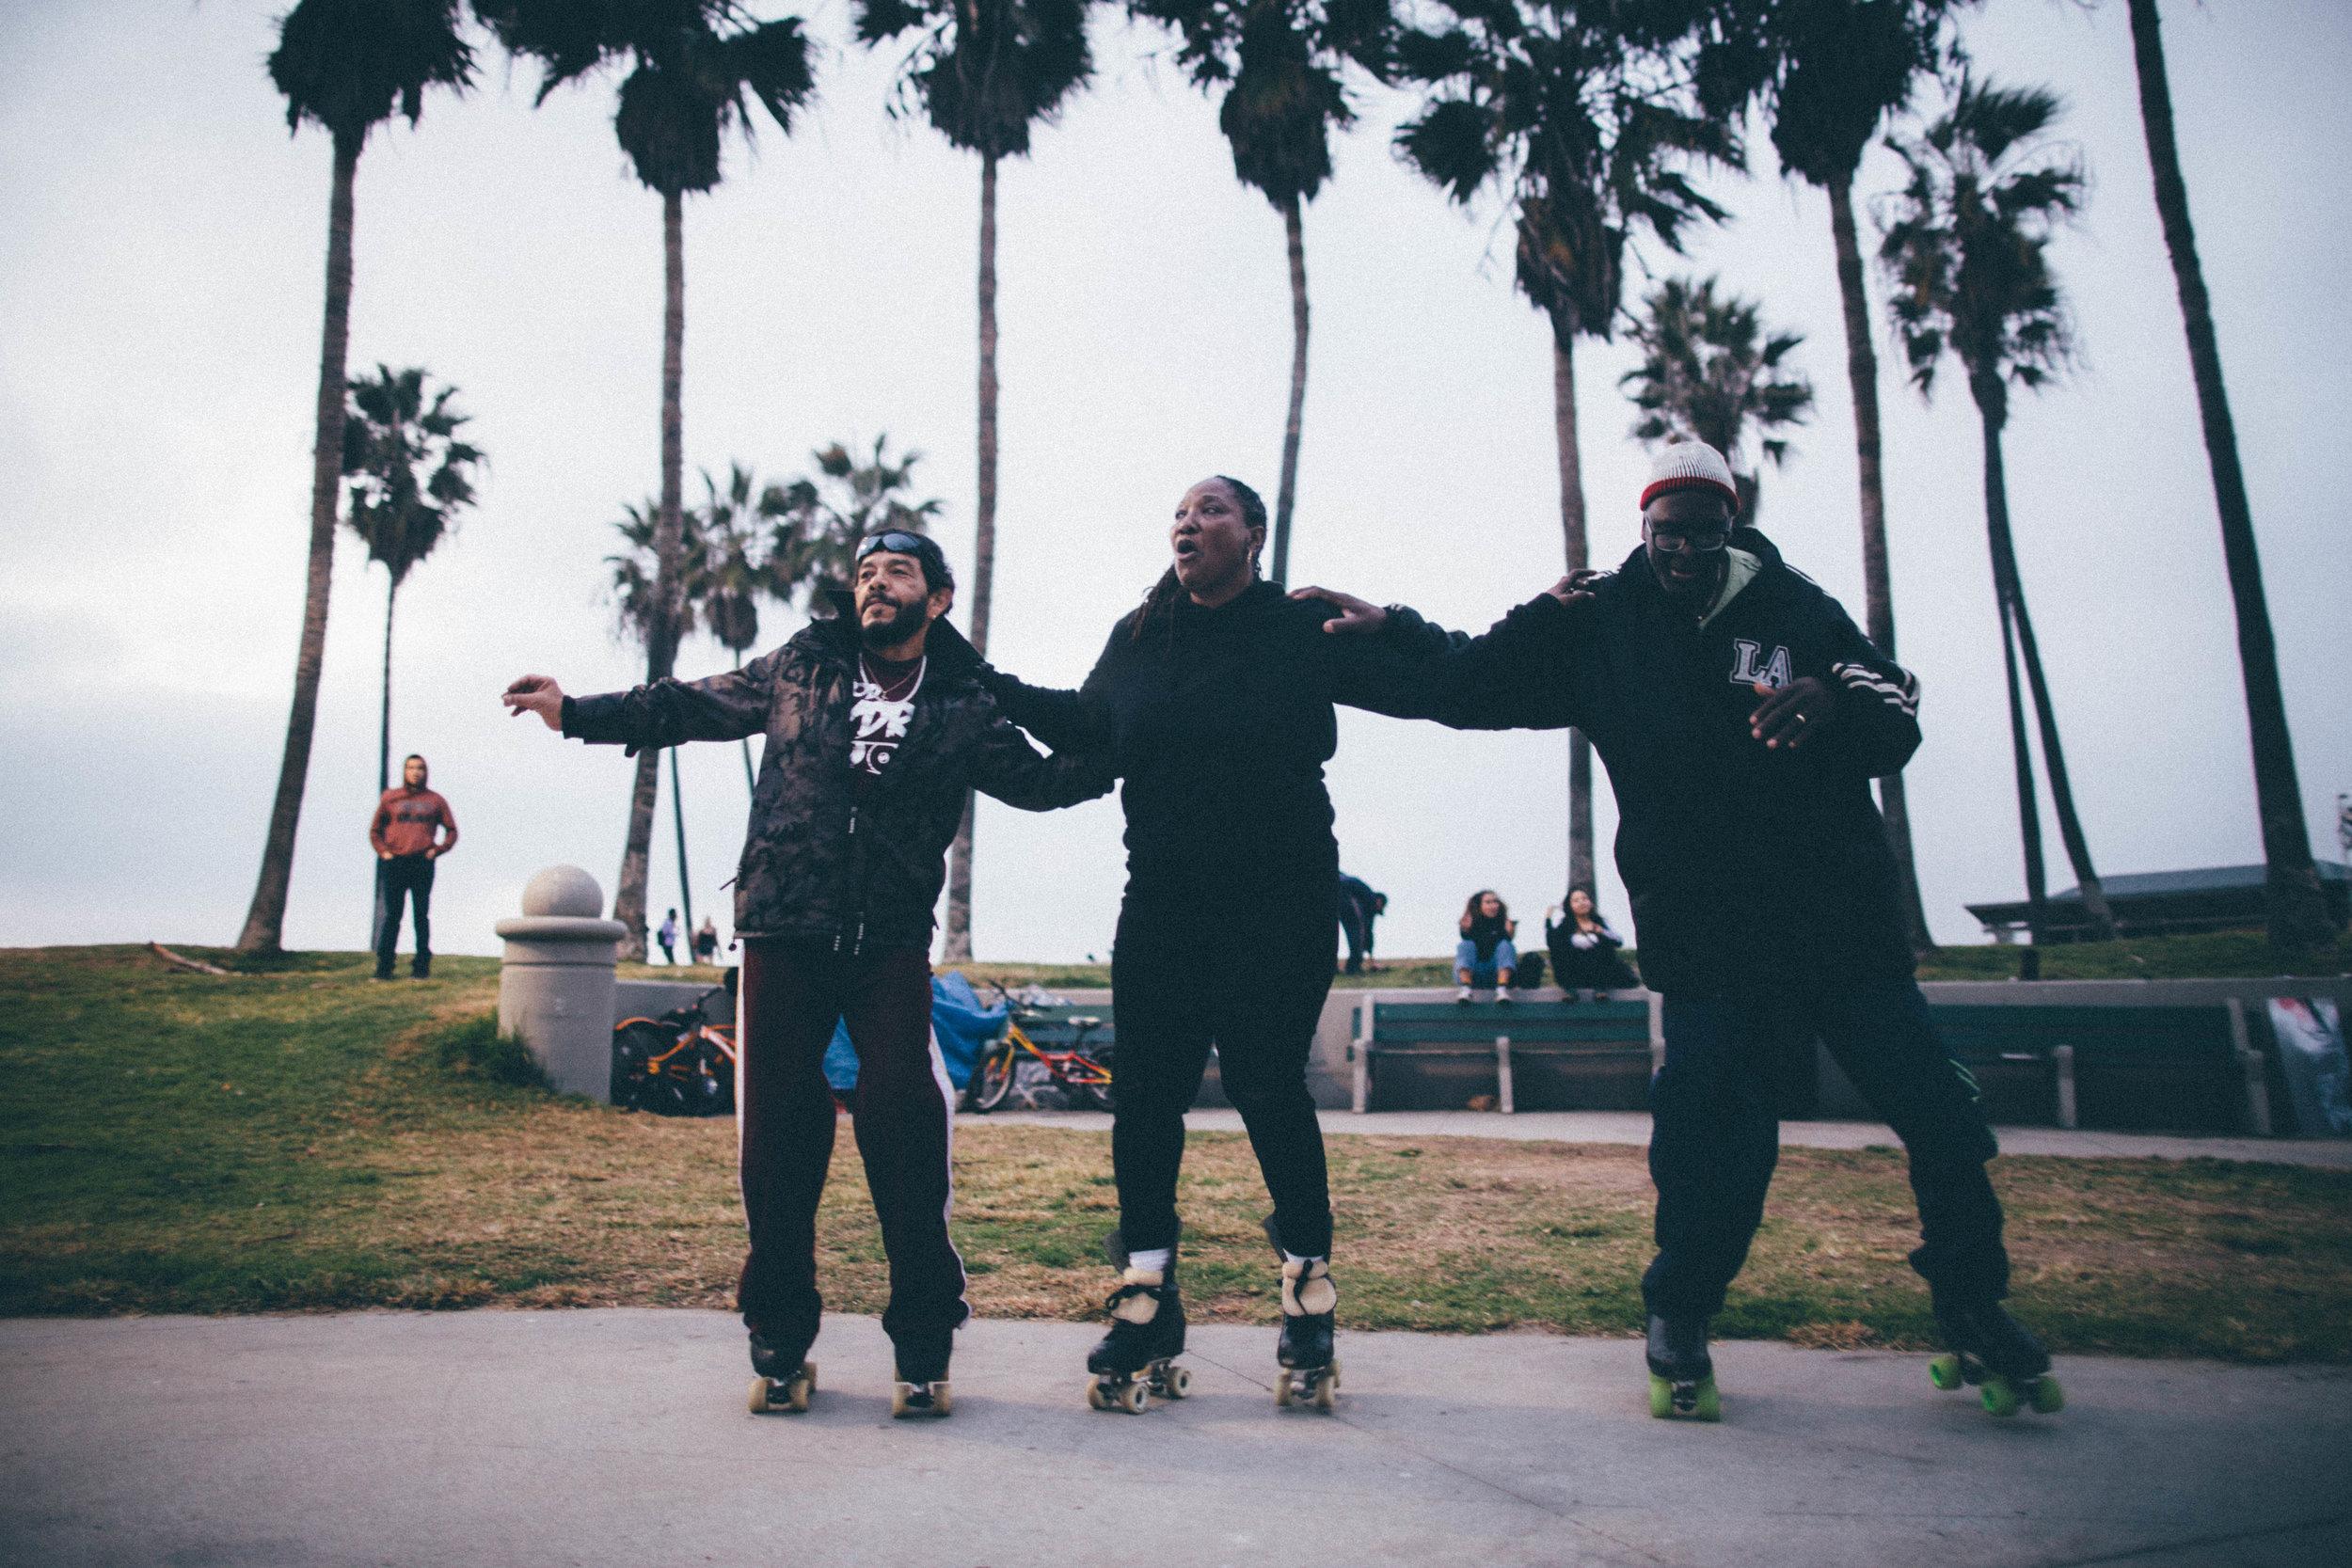 Nelson, Charlie and Richard perform a skate routine at the Venice Beach Skate Circle. Venice Beach, California.